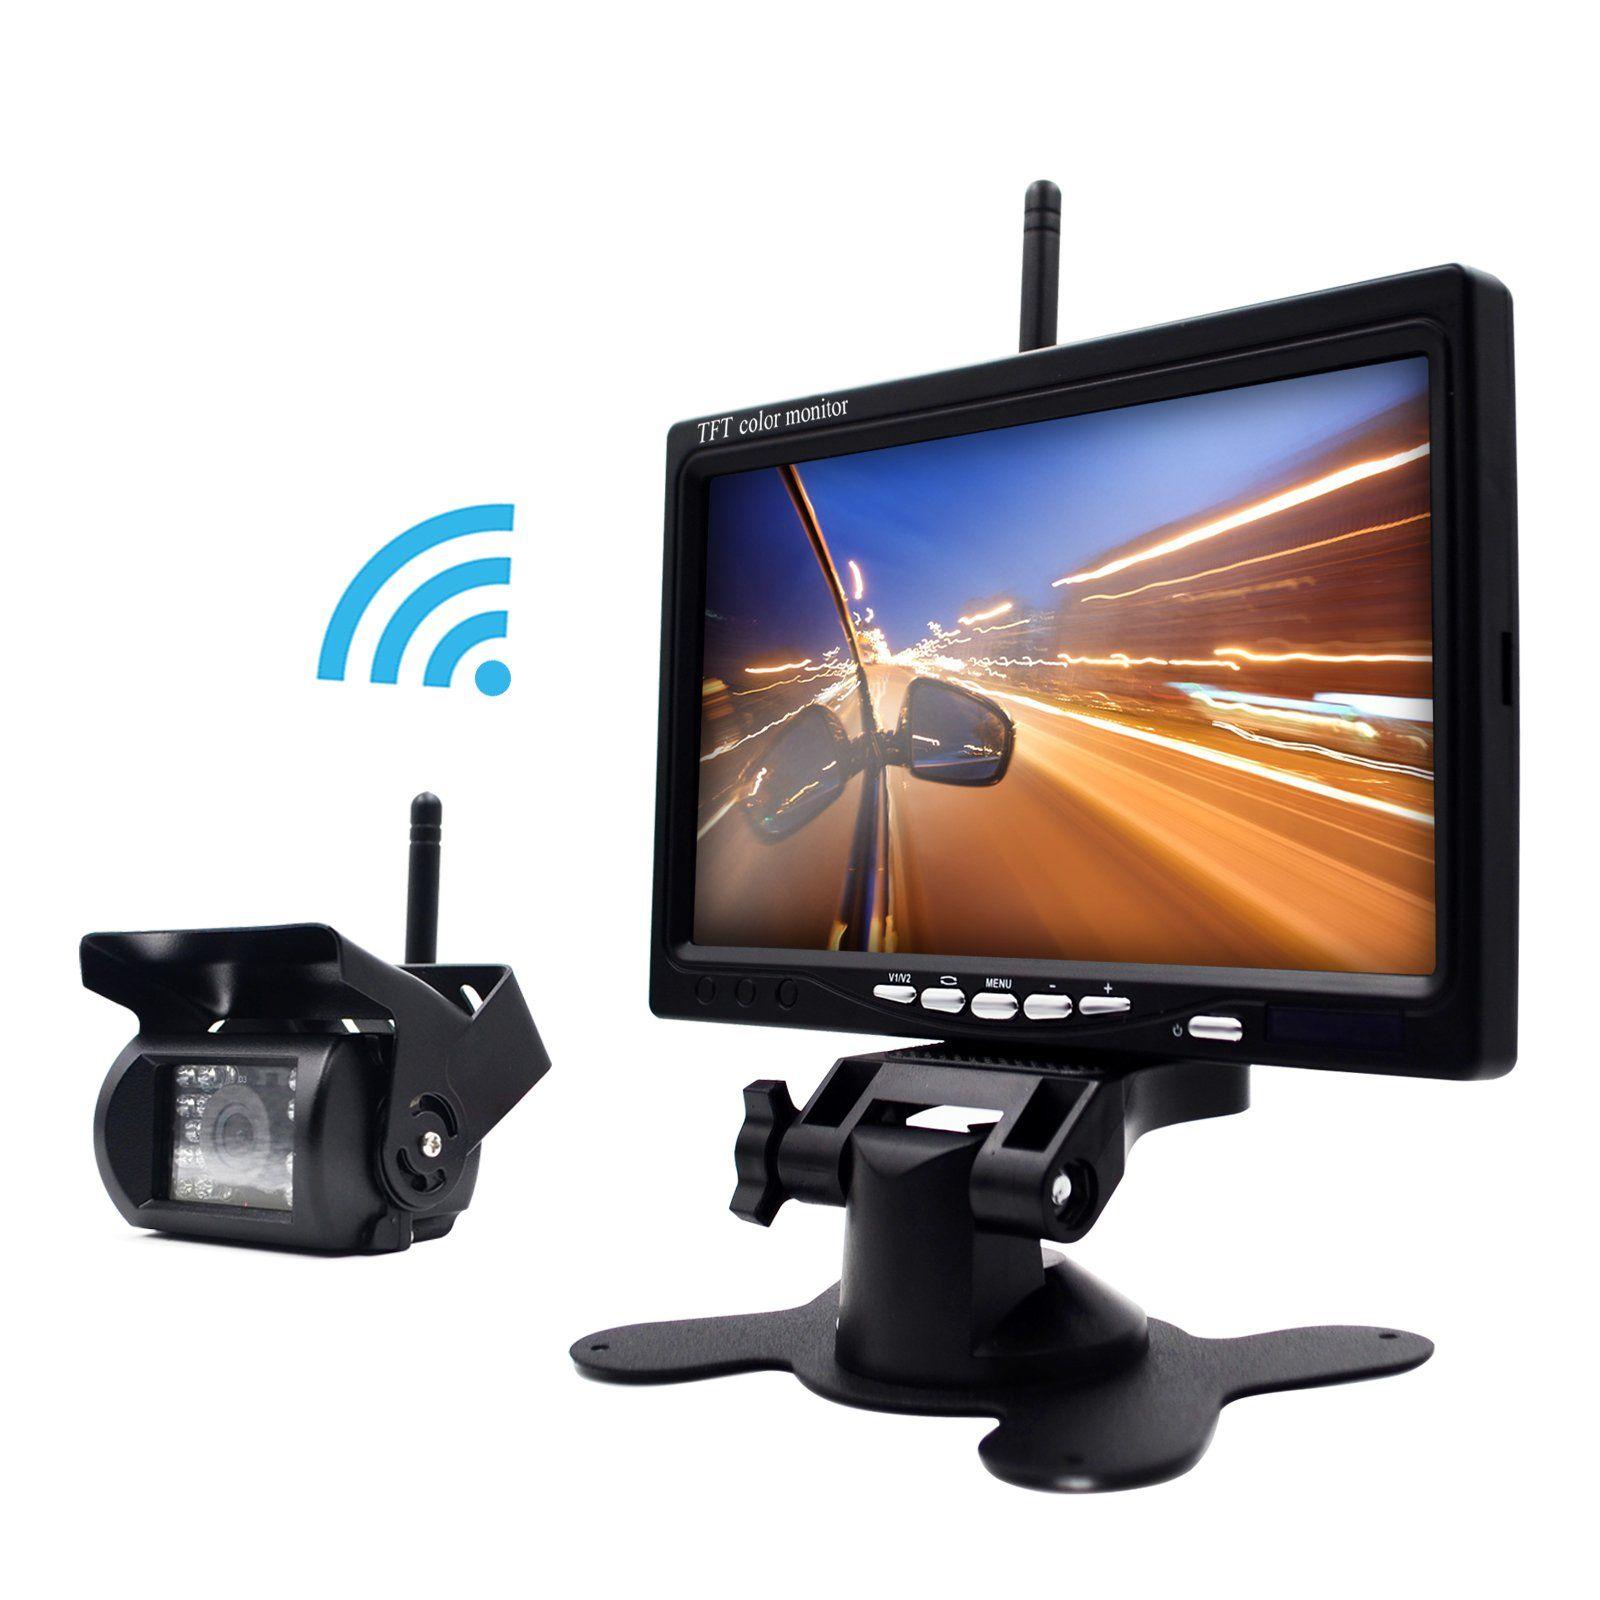 Erapta Erw01 Wireless 7 Inch Waterproof Backup Camera And Monitor System For Semi Trailer Box Truck Rv Trailer Mo Backup Camera System Backup Camera Car Camera